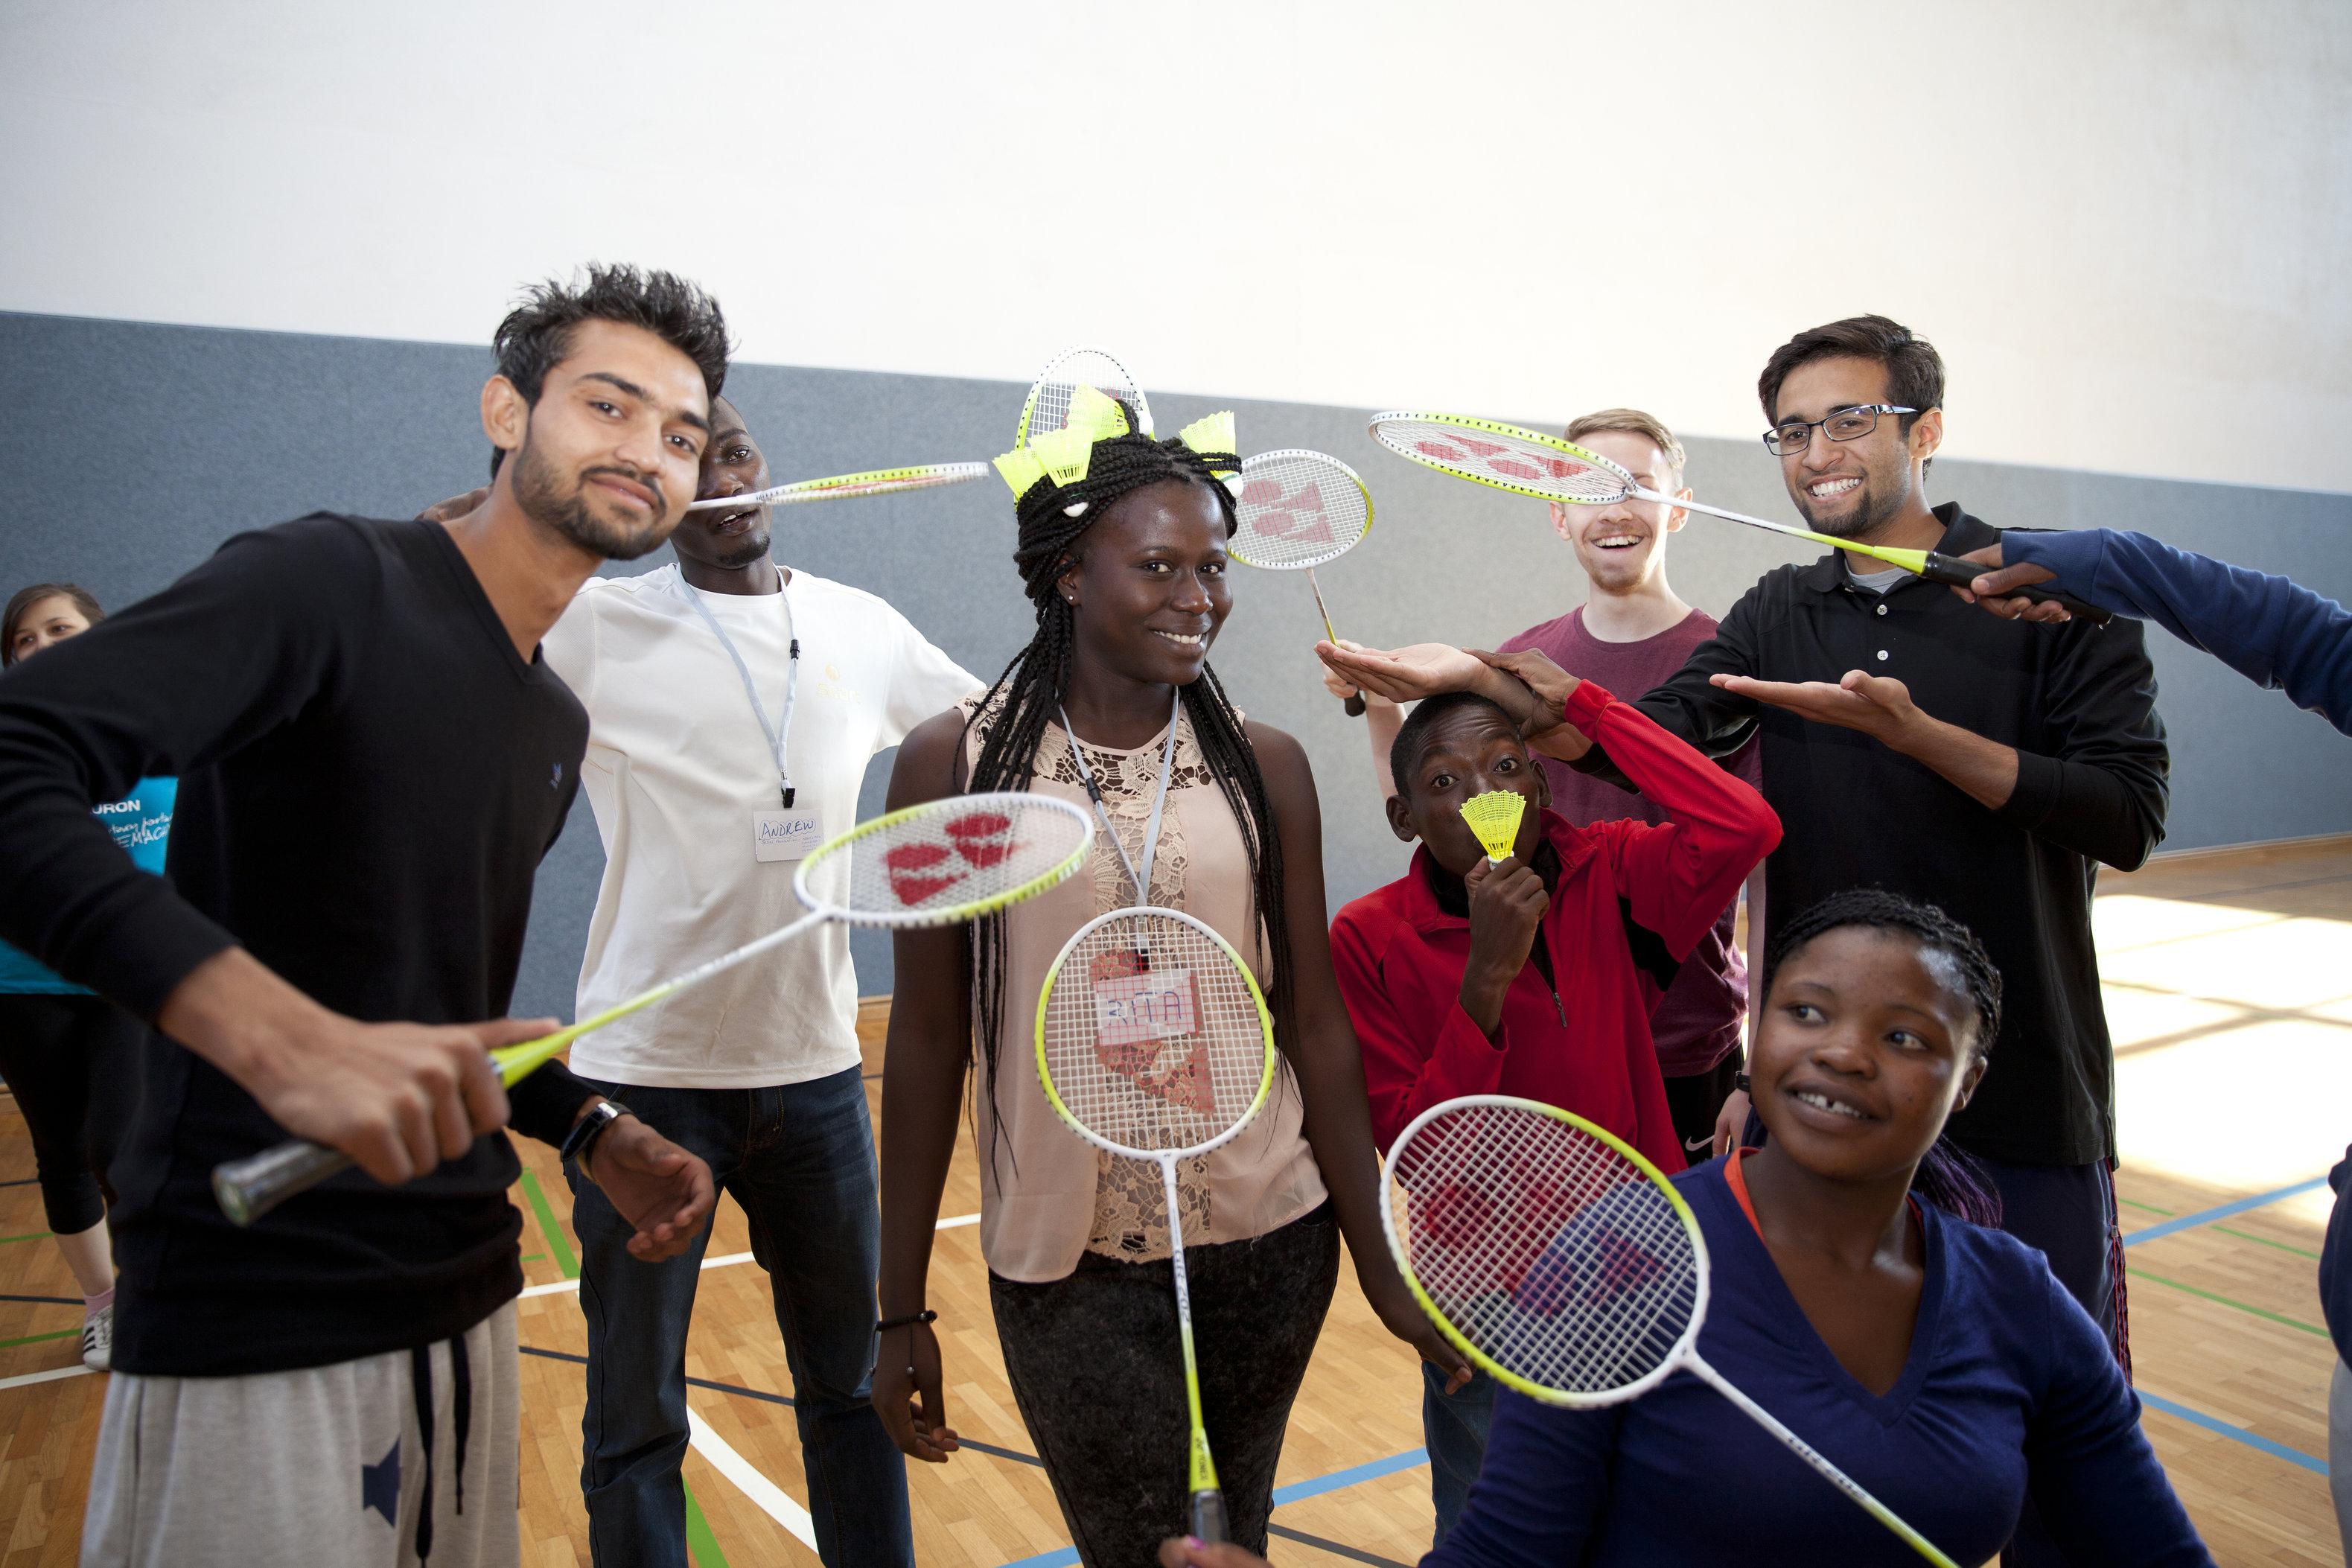 Badminton World Federation. Shuttle Time. Youth Leadership Camp (YLC) organized by UNOSDP and GIZ. Berlin 2015. (c) Esteve Franquesa.